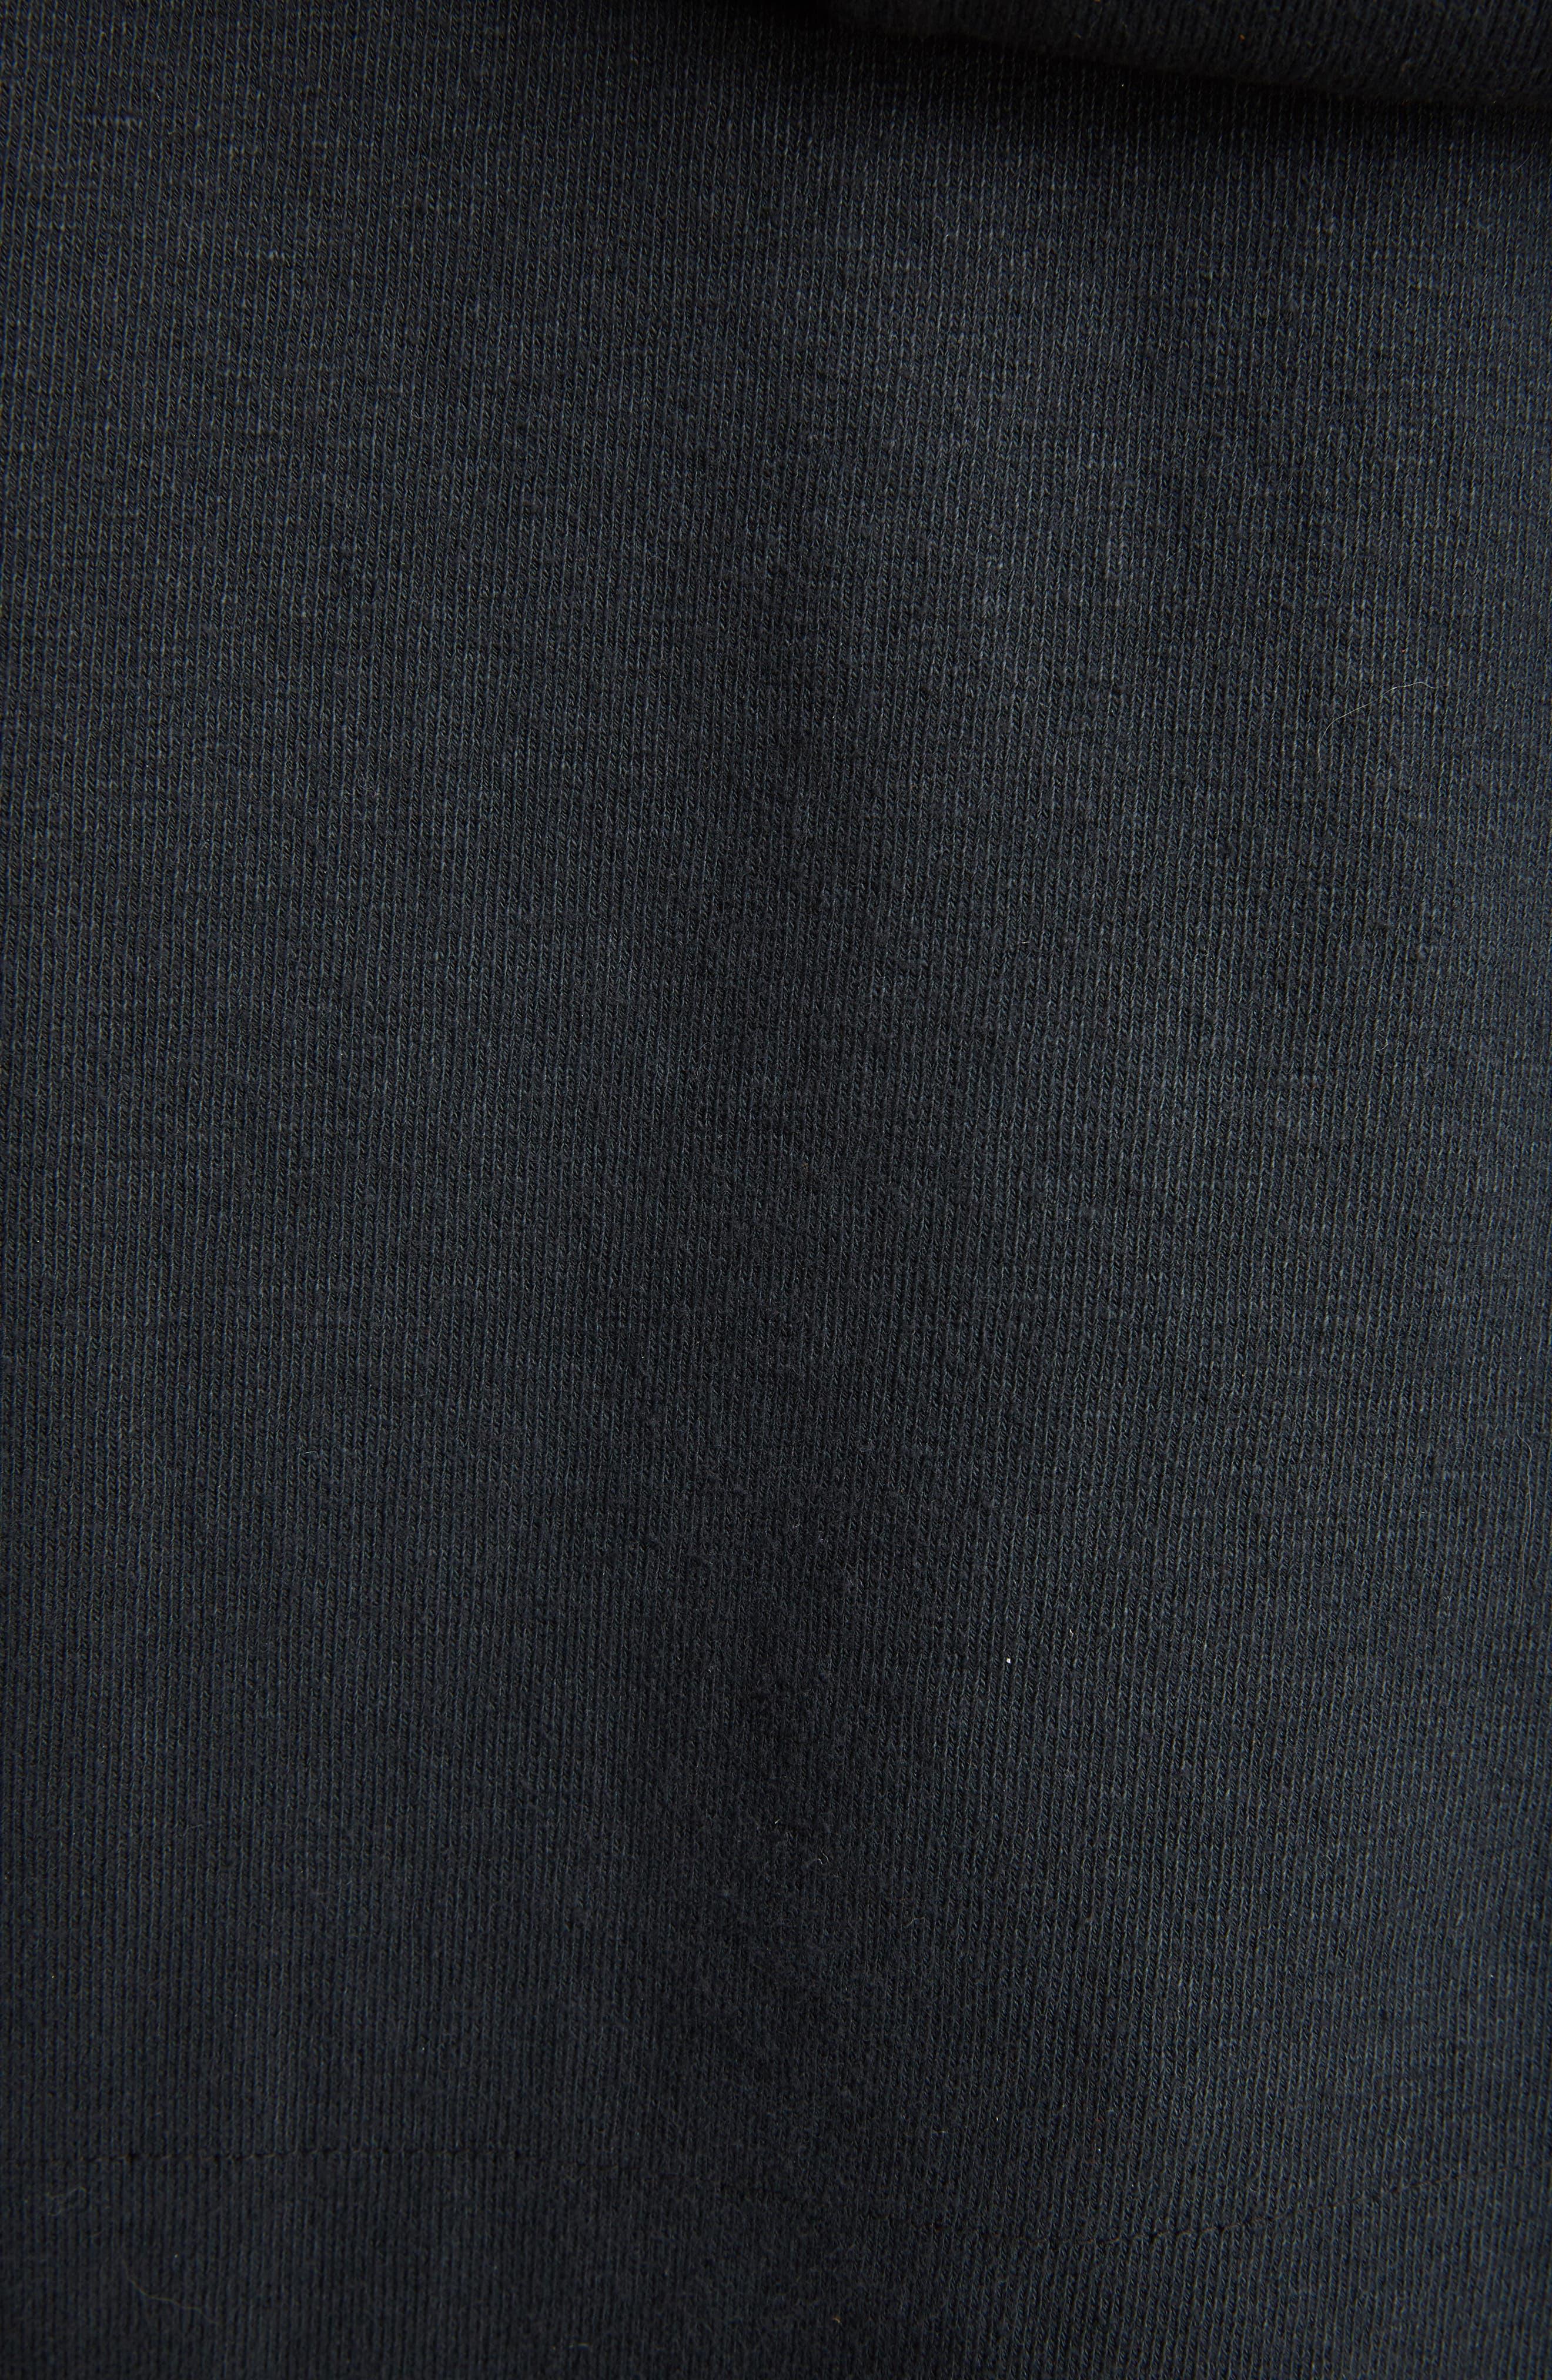 J.W.ANDERSON Oversized Crop Hoodie,                             Alternate thumbnail 5, color,                             001